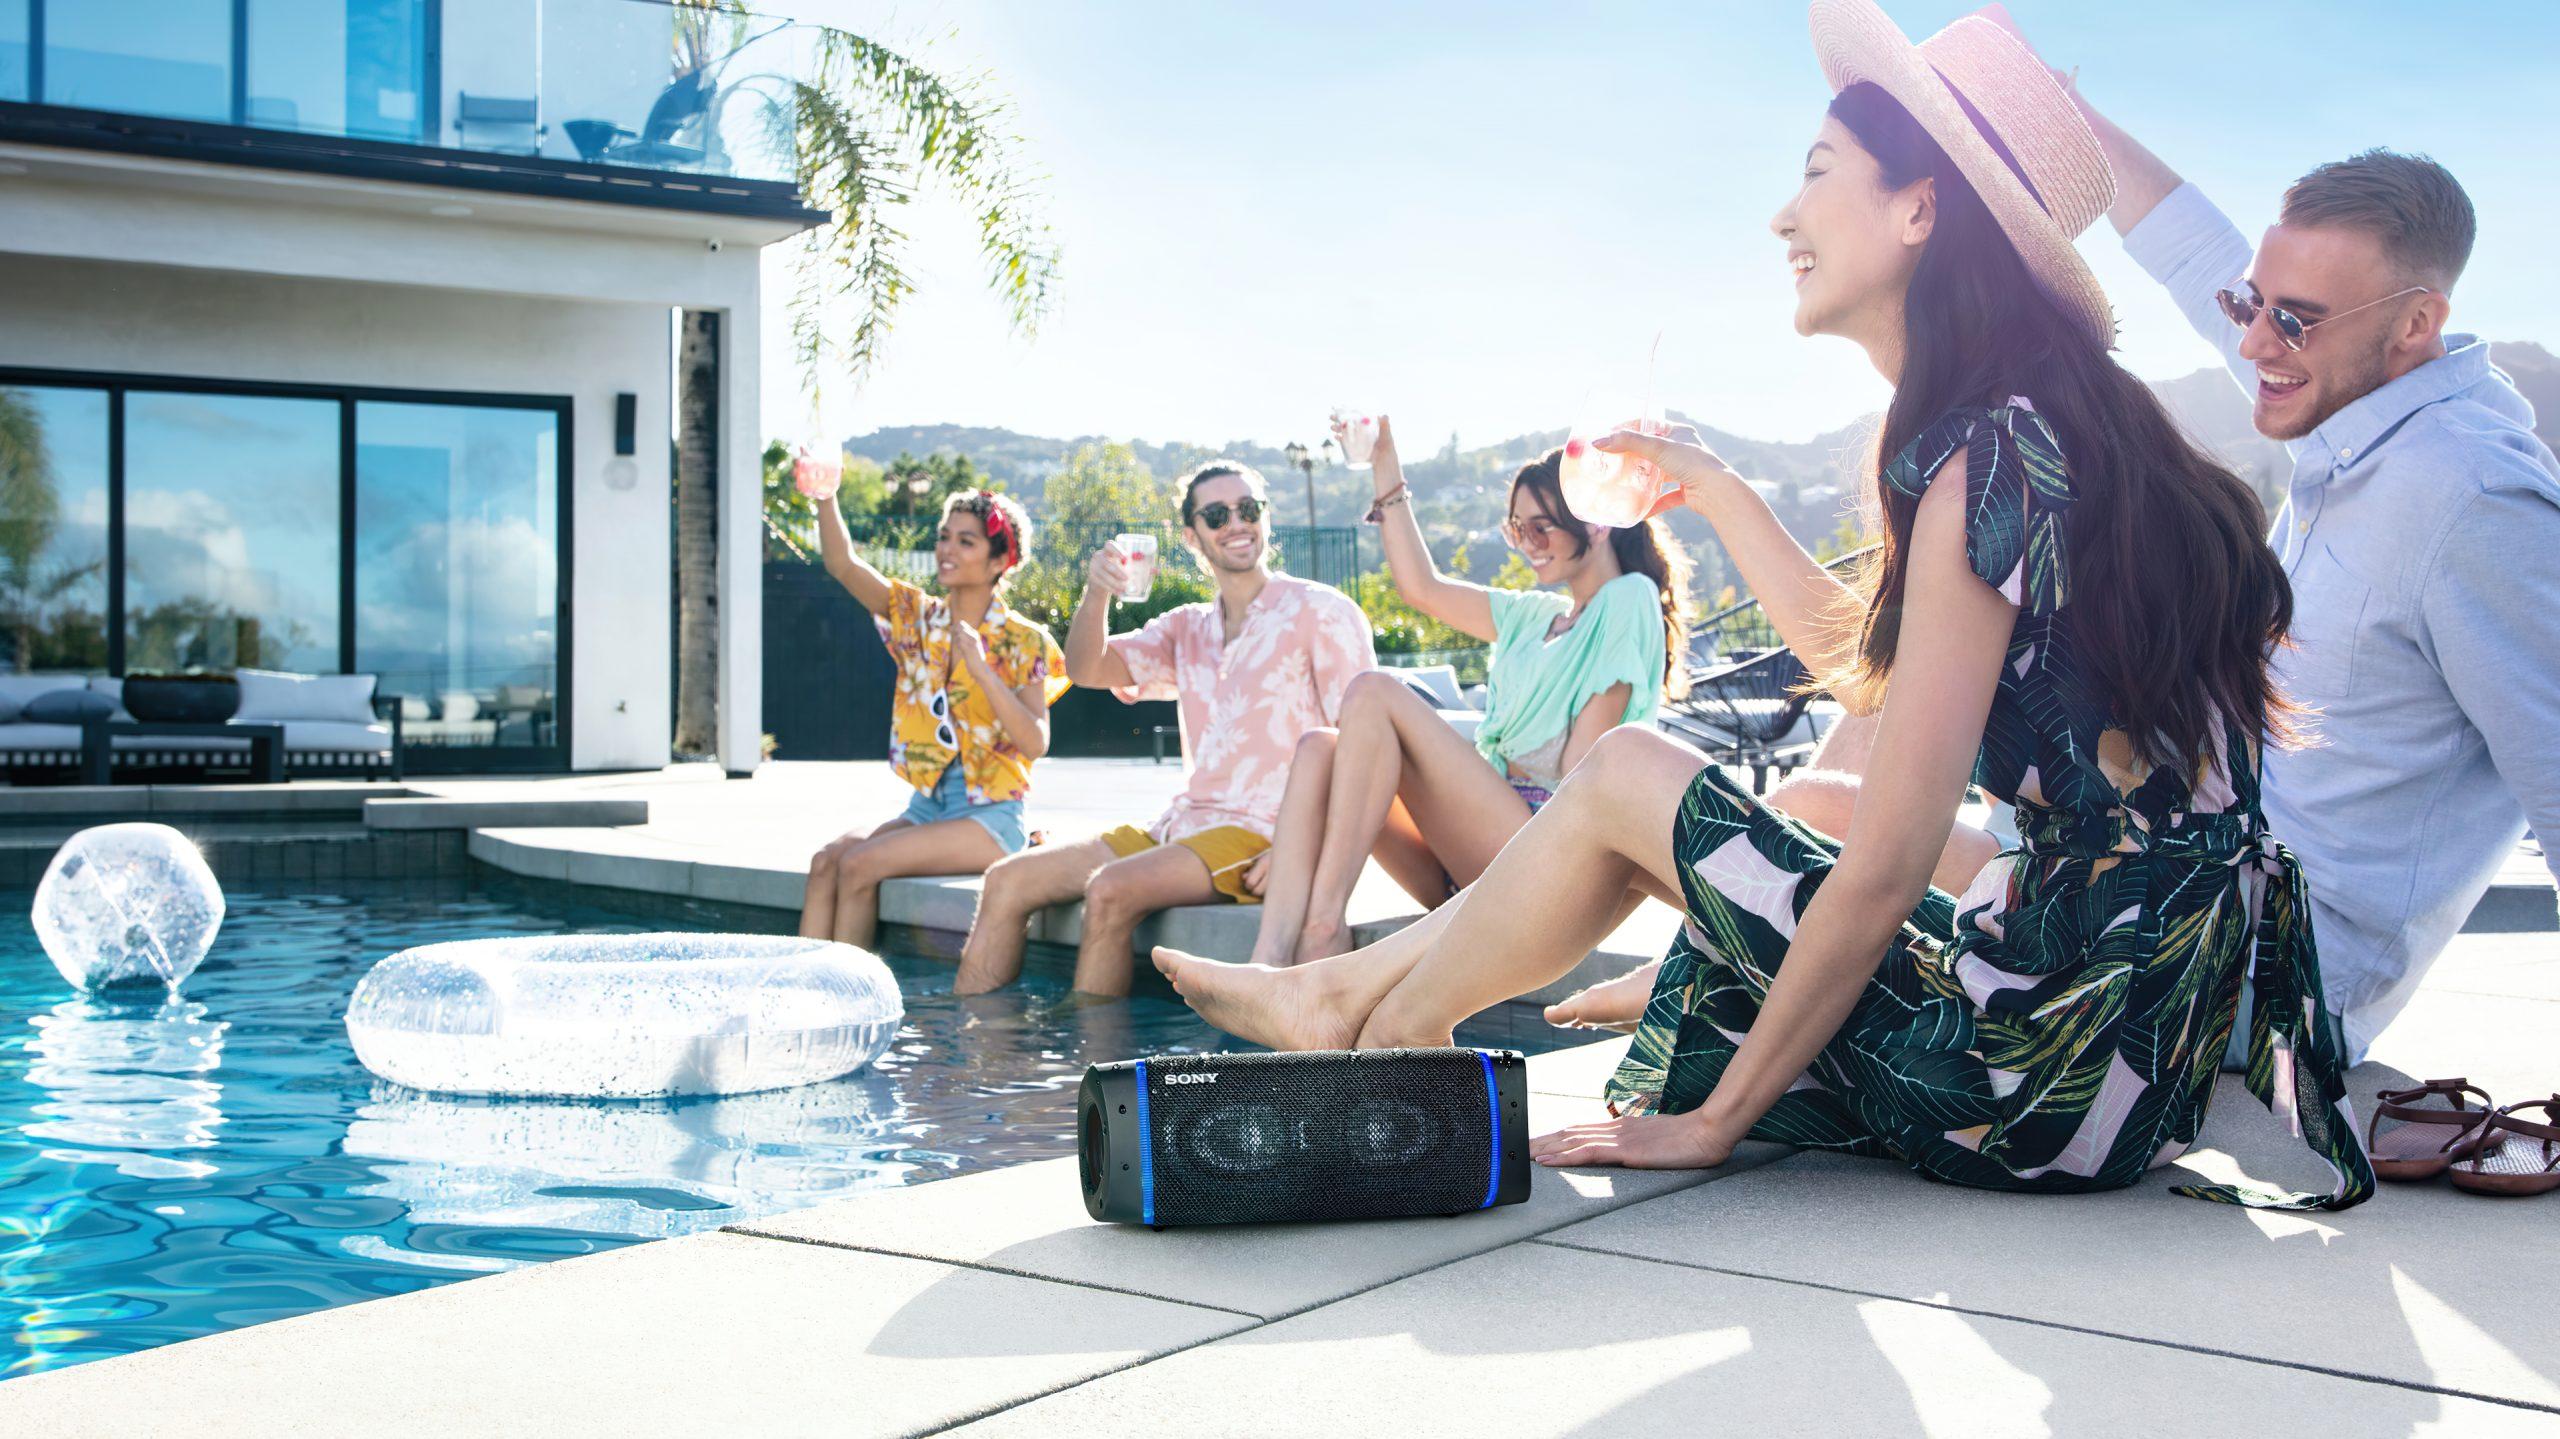 Sony SRS-XB33 lifestyle